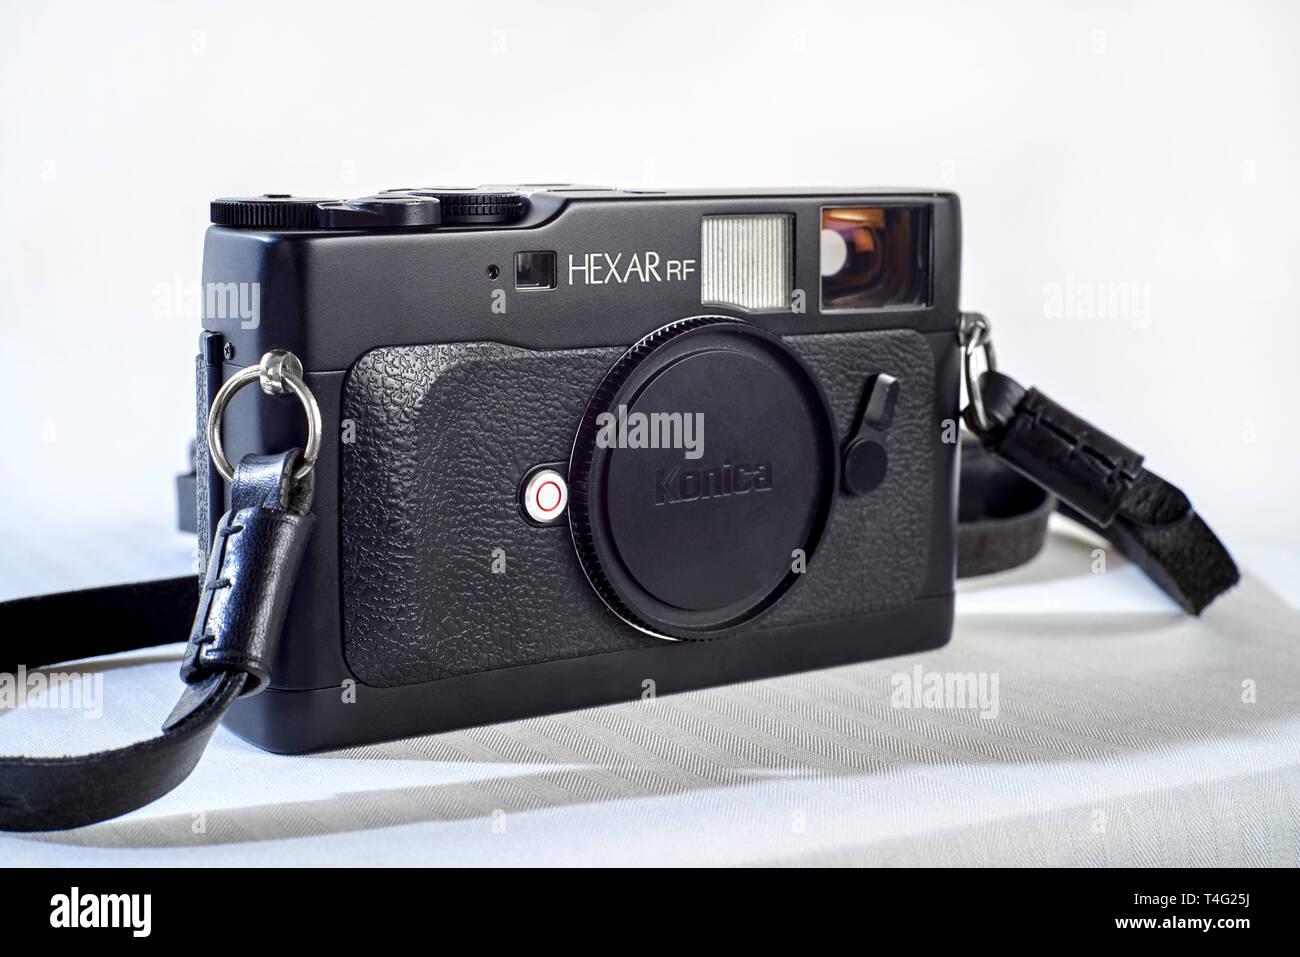 Vintage Film camera, Konica Hexar RF vintage Japanese rangefinder camera now discontinued - Stock Image